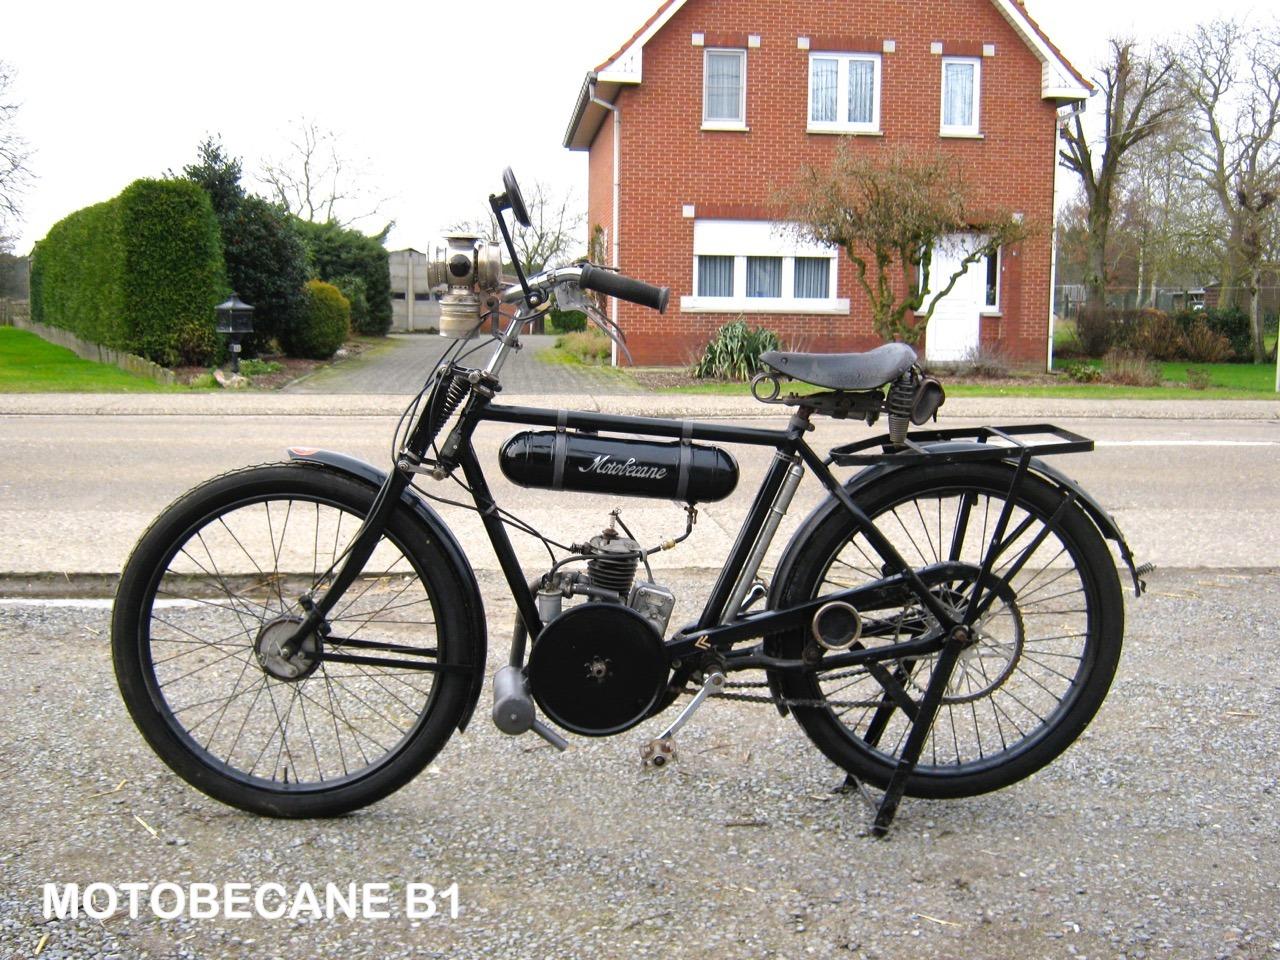 motobecane-b1-4